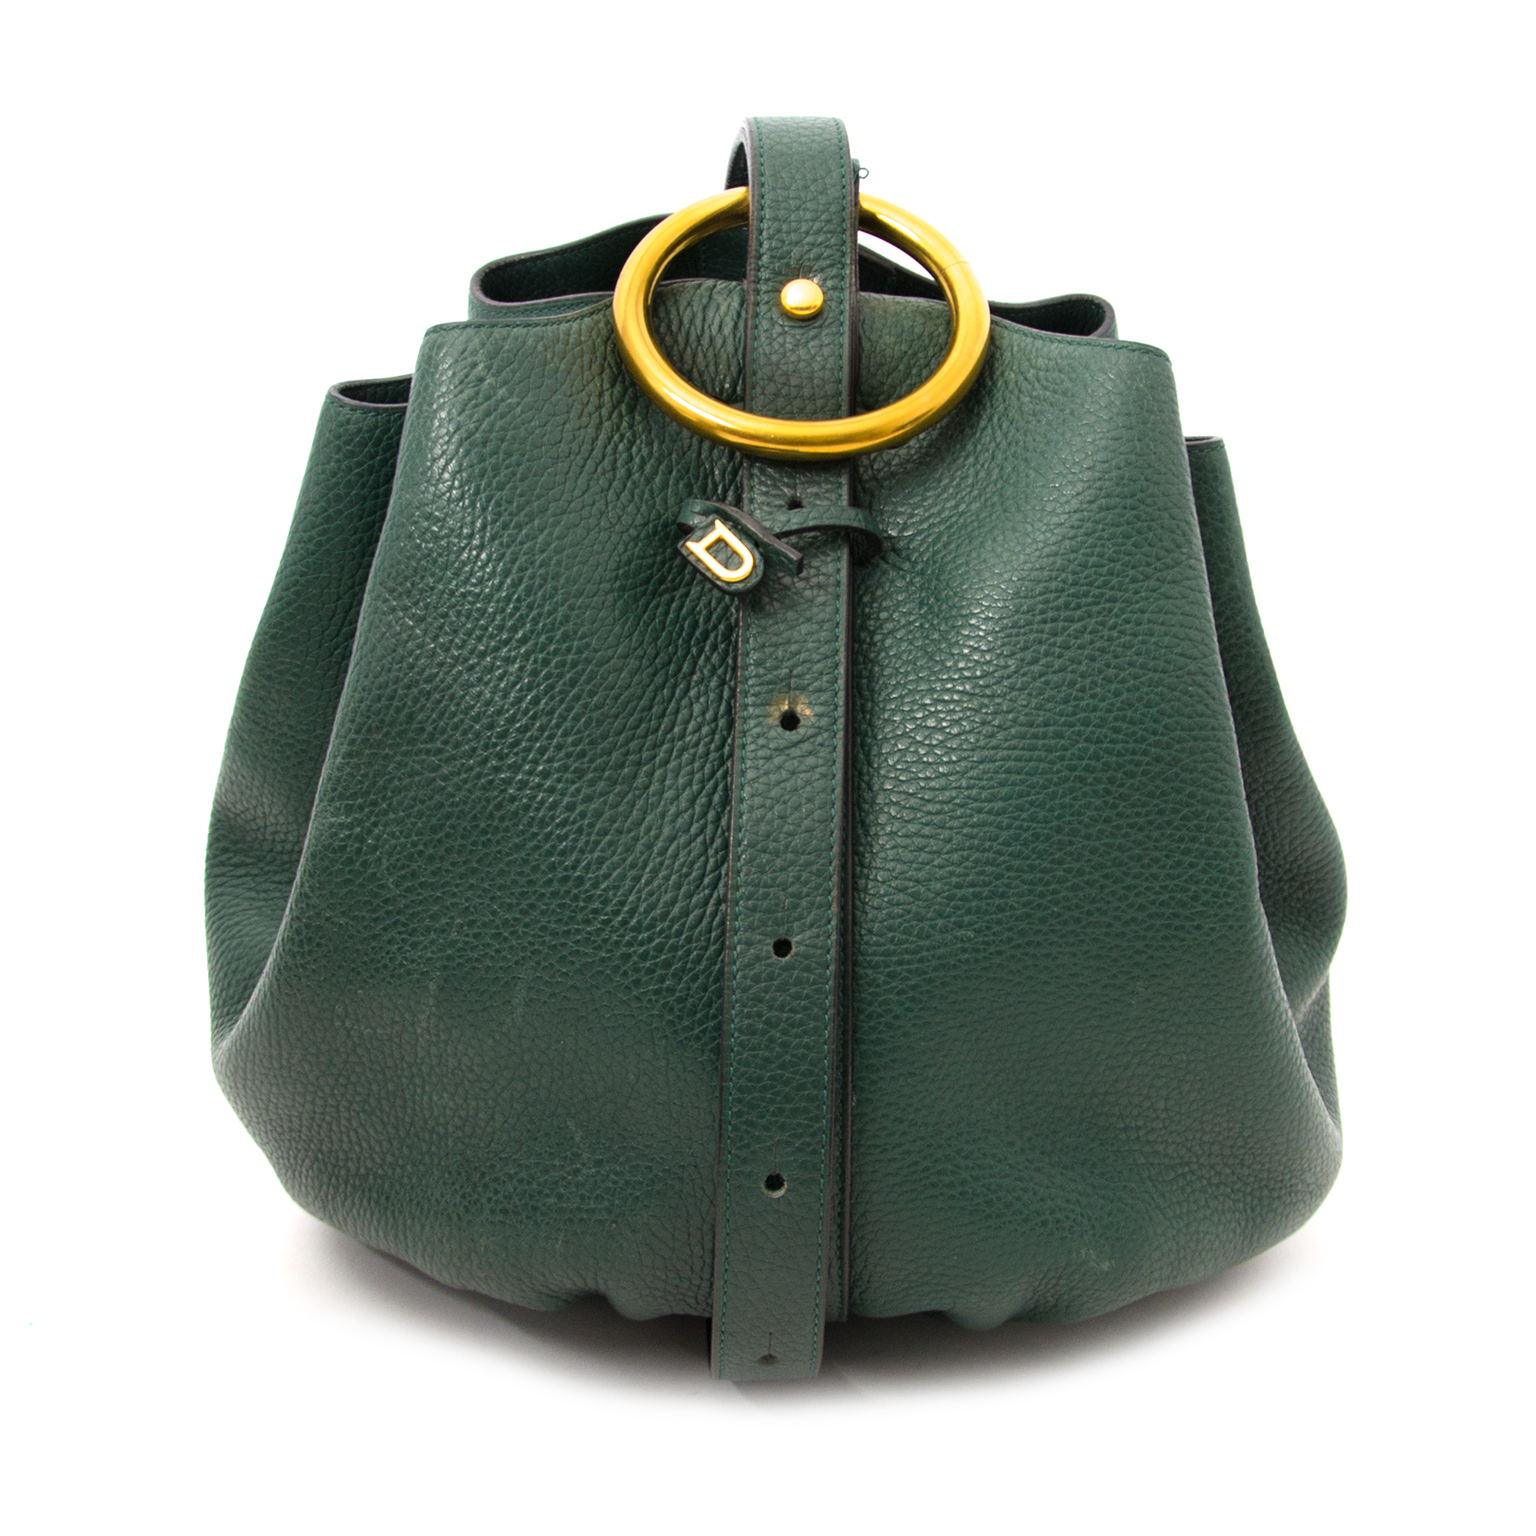 Delvaux Rose Des Vents Shoulder Gathered Bucket Bag Green à vendre en ligne www.labellov.com, seconde main en luxe vintage.